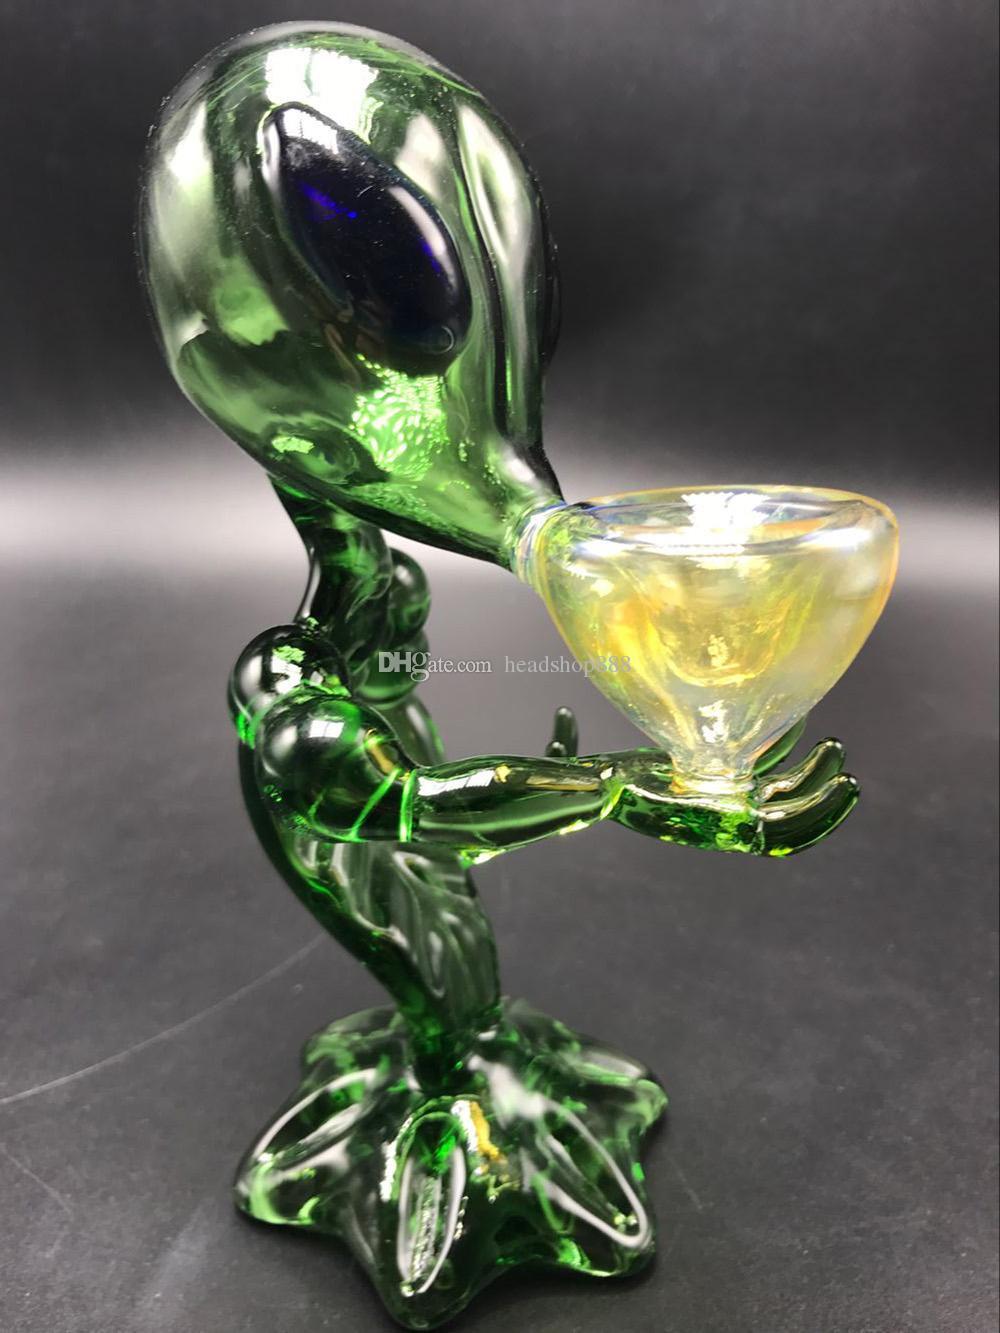 "Alien verre Pipe Pipes 6,69"" pouces vert point G Pipes Smoking Alien verre huile Rig Pipe en verre cuillère"